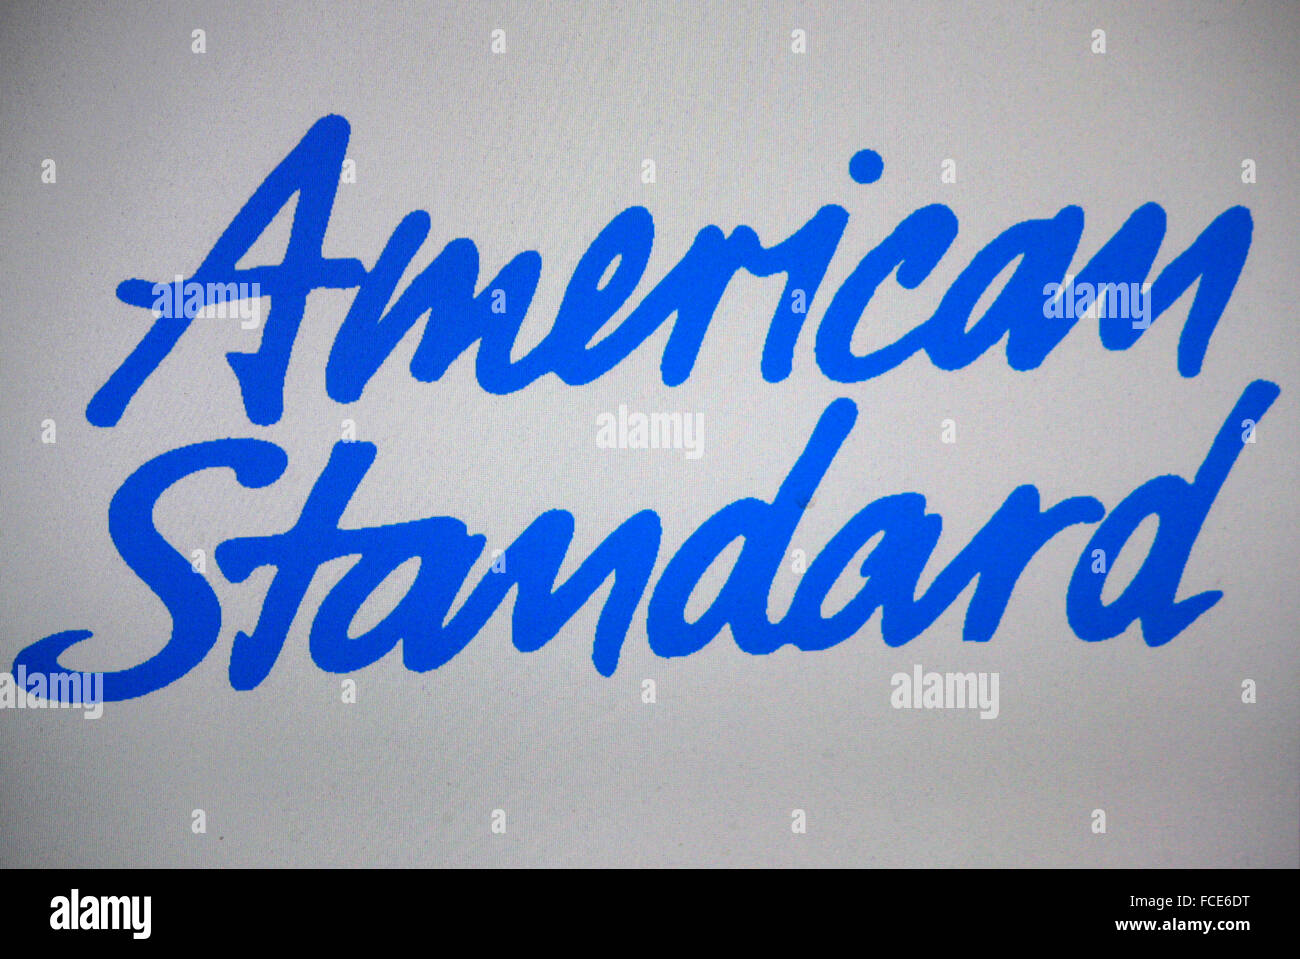 American Standard Stock Photos & American Standard Stock Images - Alamy